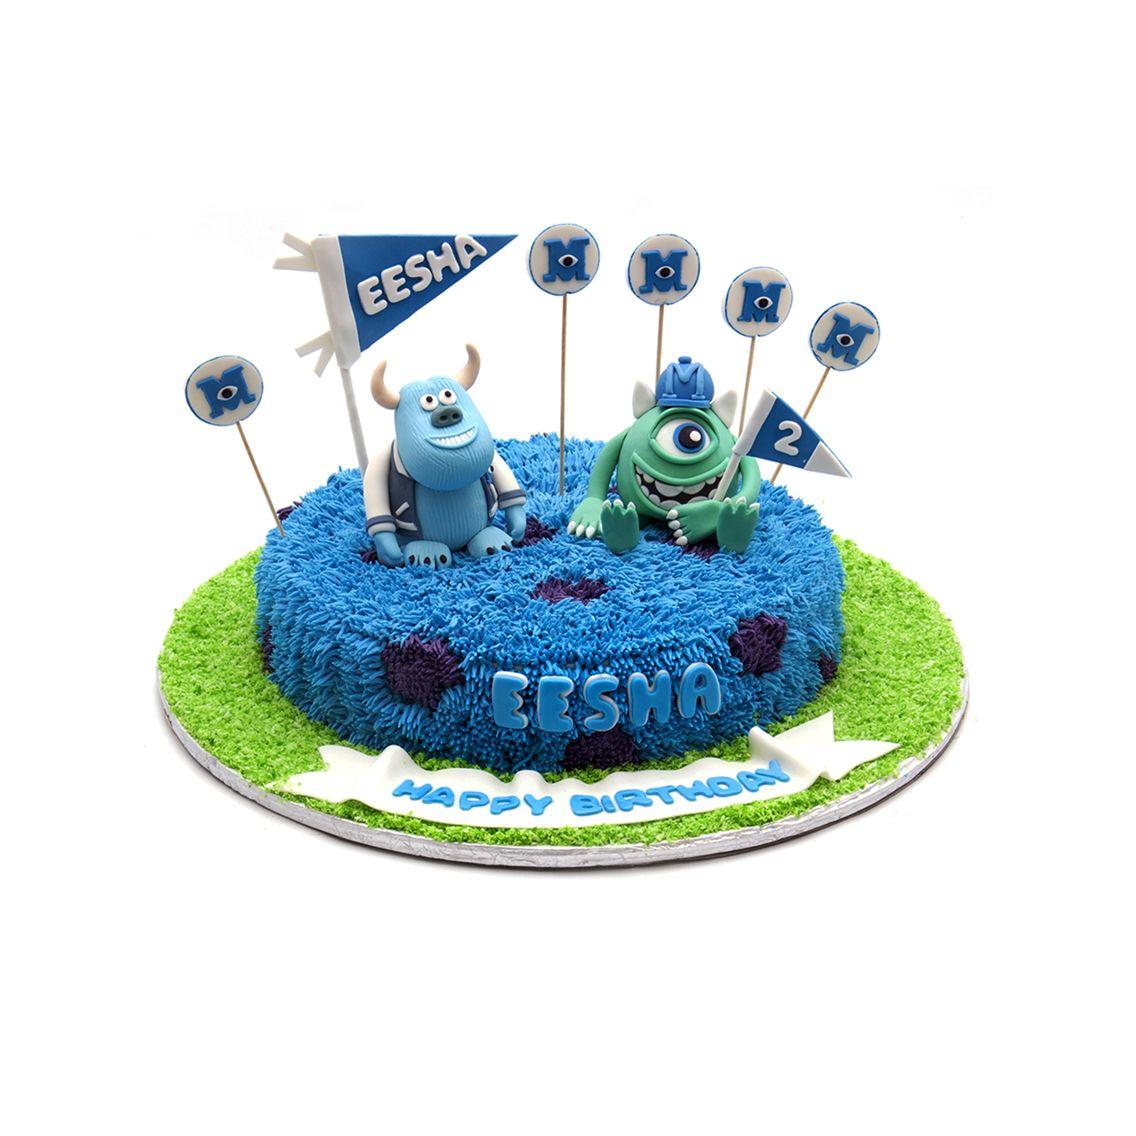 Kitchen Cuisine Default Category Monsters Inc Cake